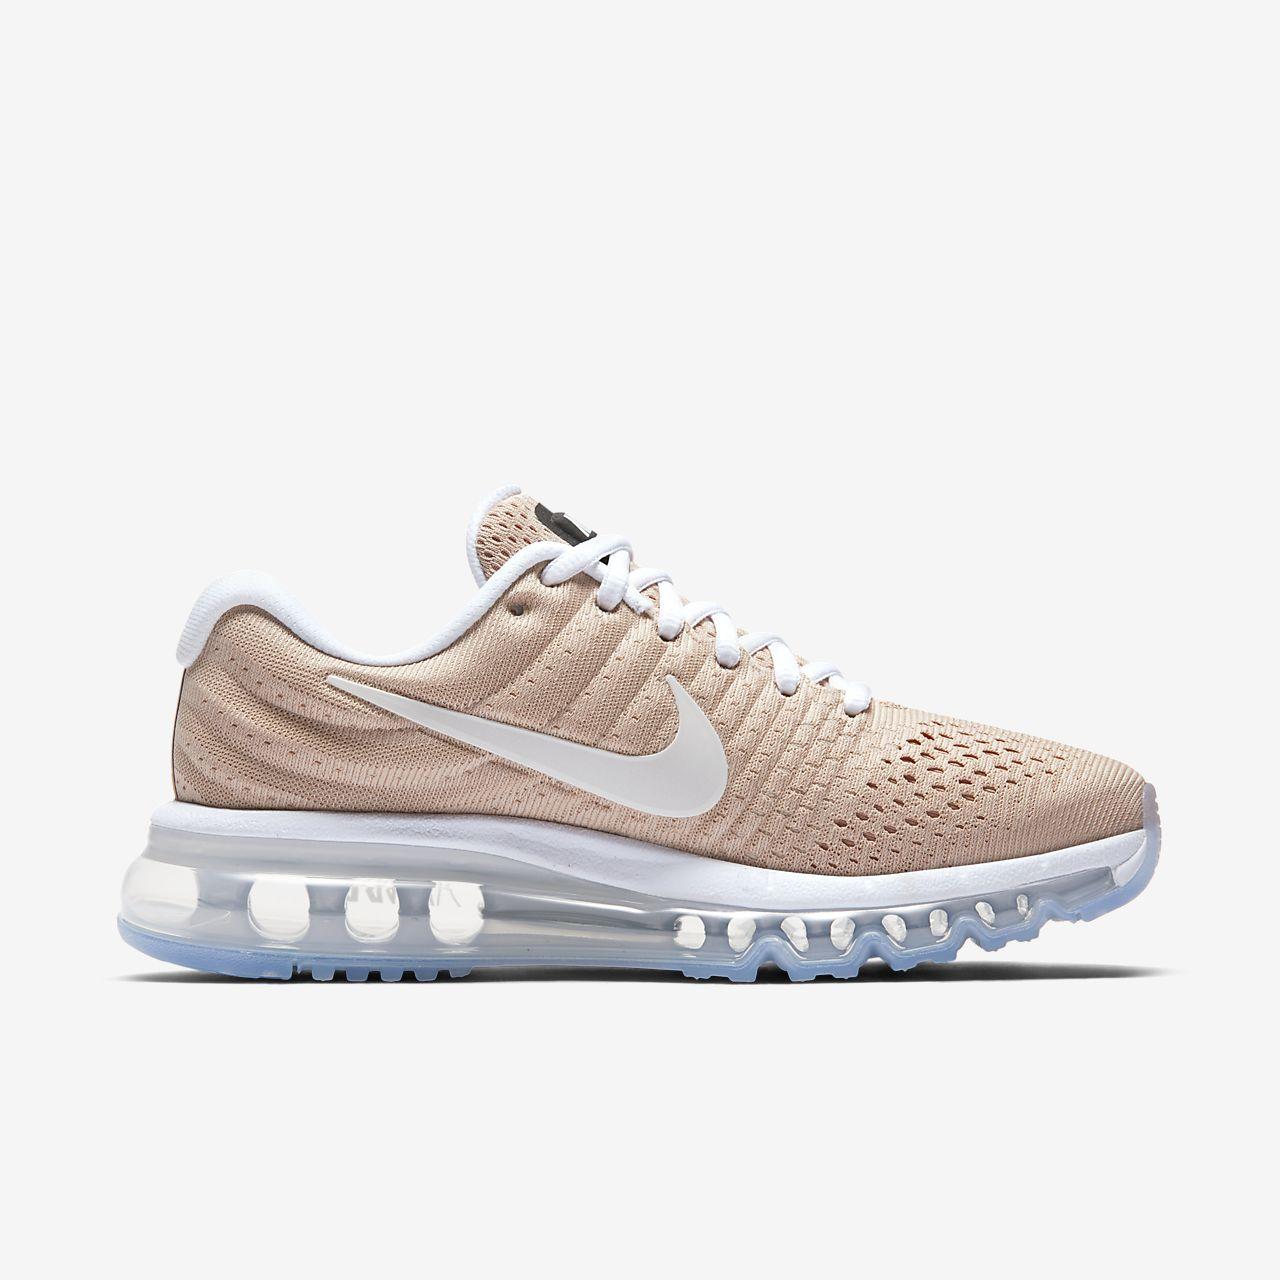 Nike Air Max 2017 beige